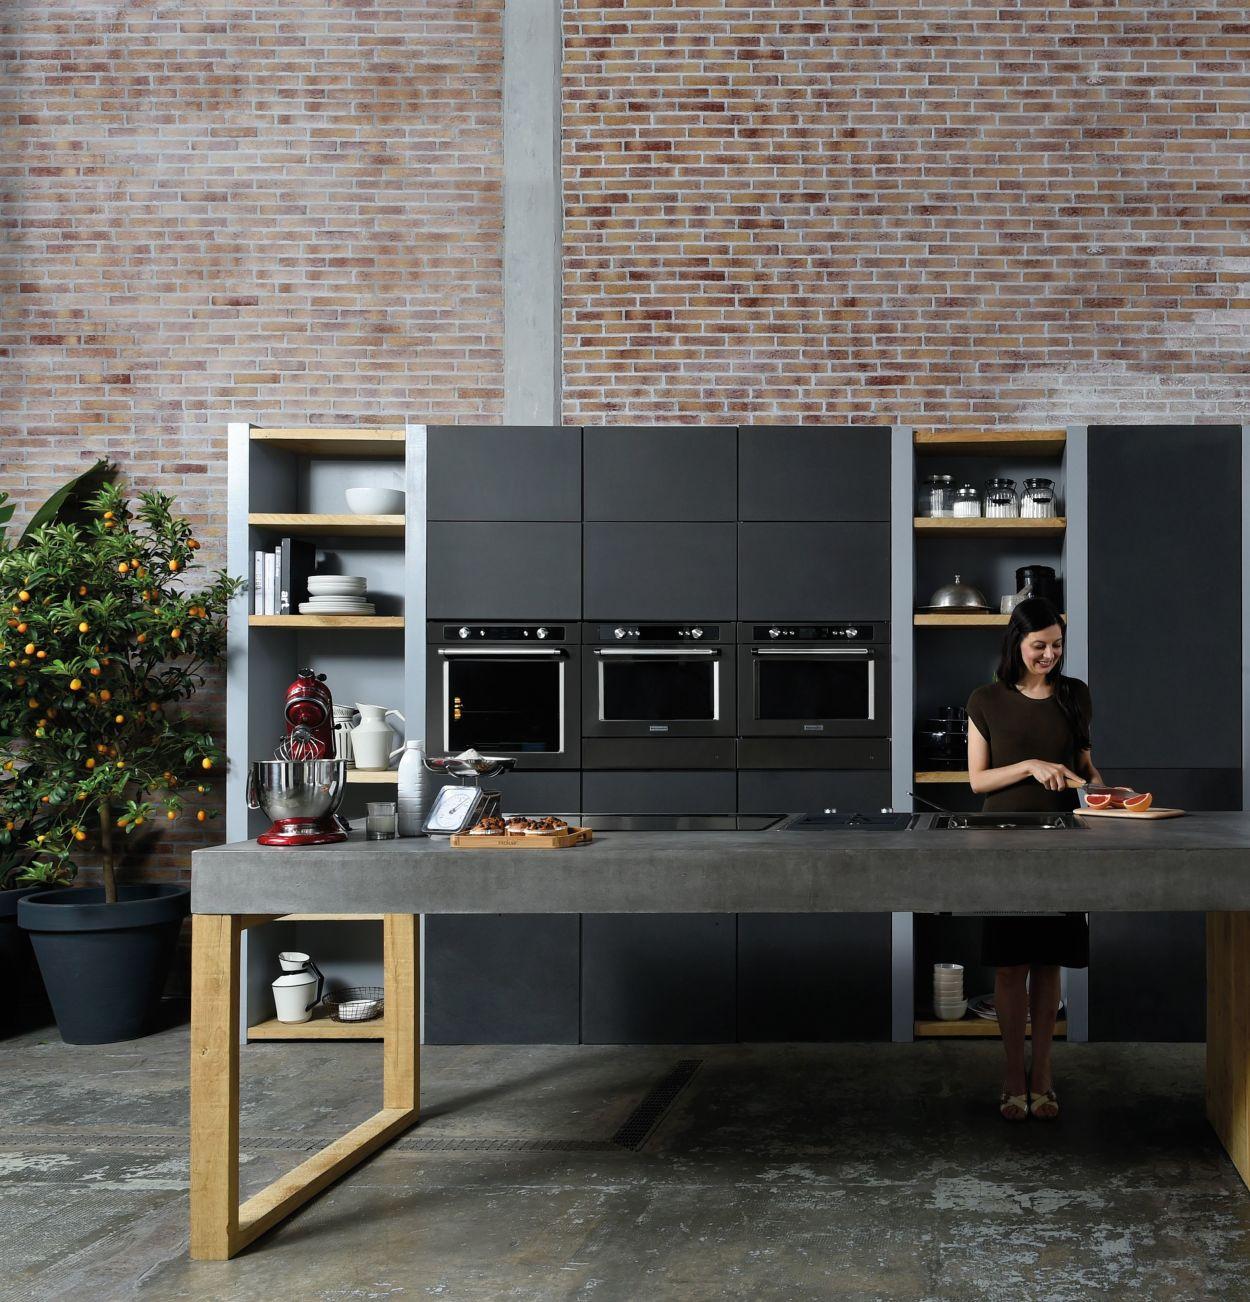 Kitchenaid, Black Line